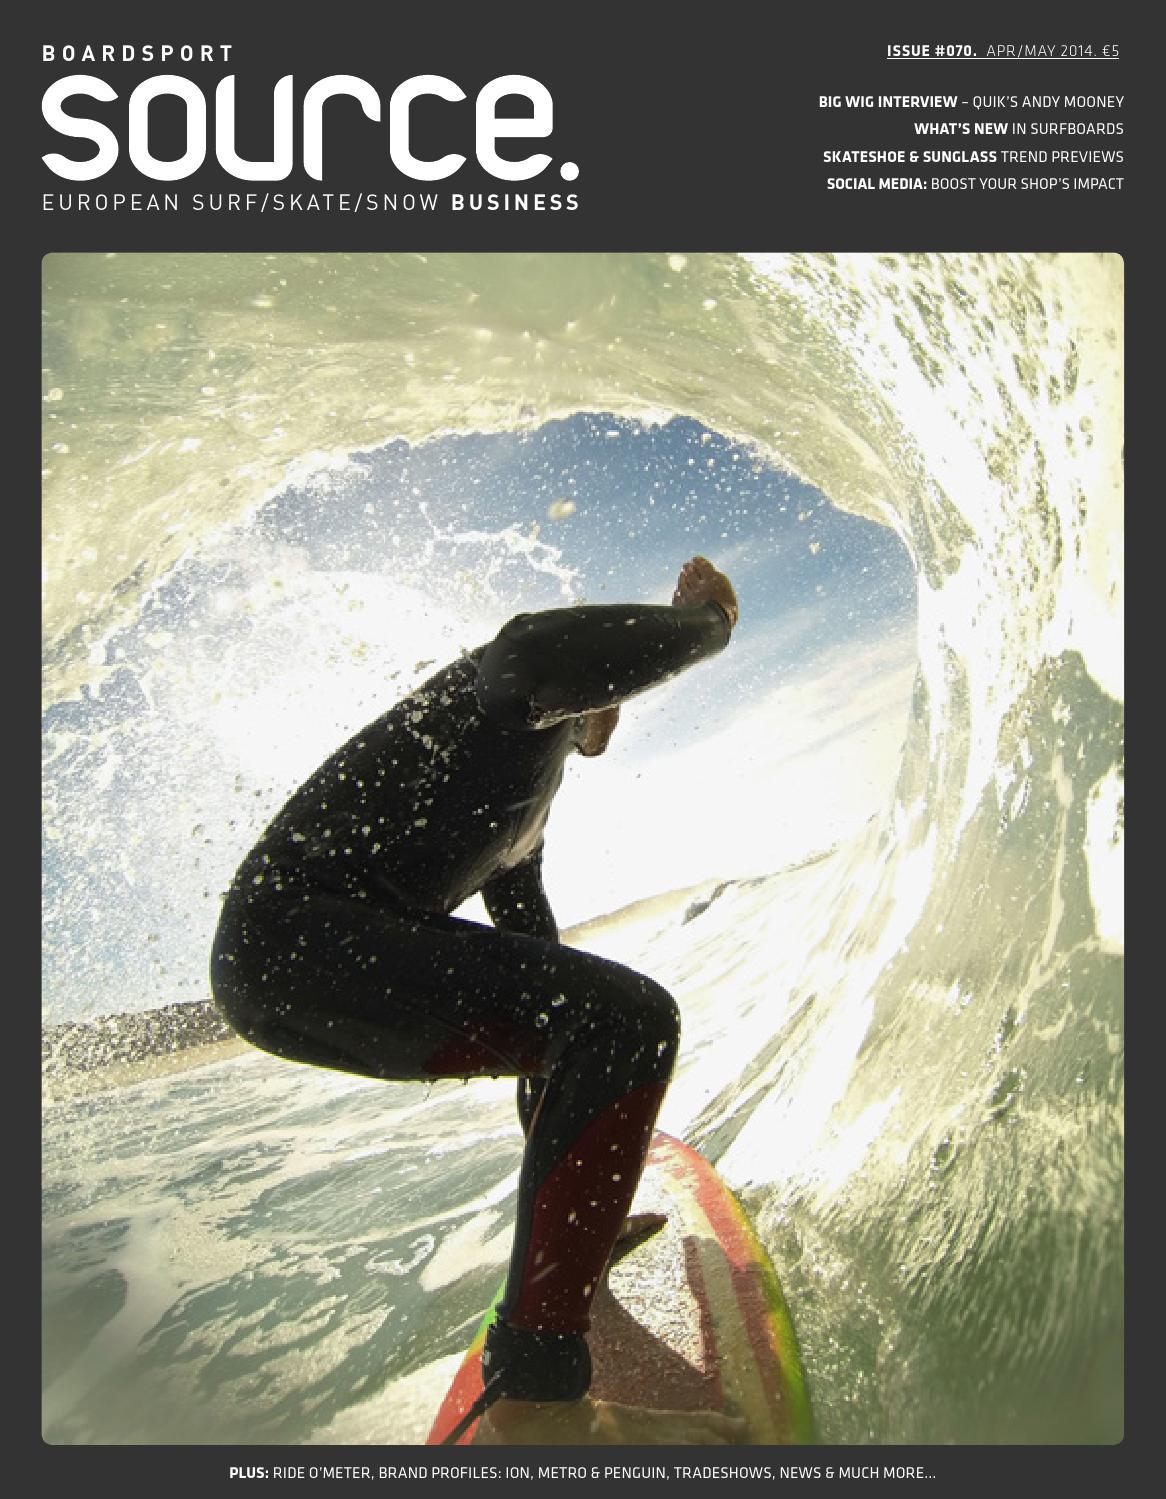 LIB TECH snowboard skateboard surf ski 2014 BIG LOGO DIE CUT STICKER #3 New